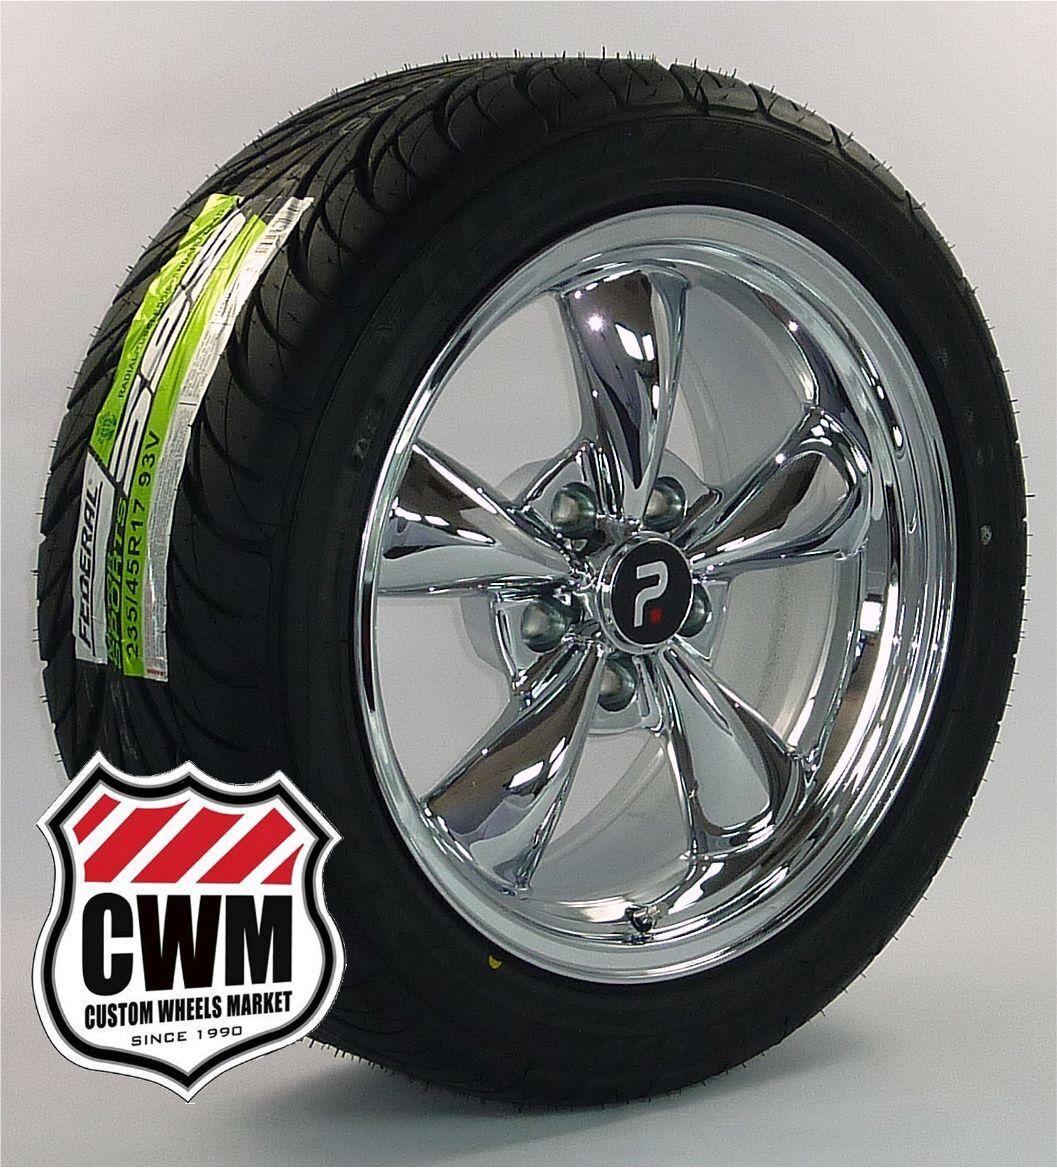 Classic 5 Spoke Chrome Wheels Rims Federal Tires for Chevy Nova 68 79